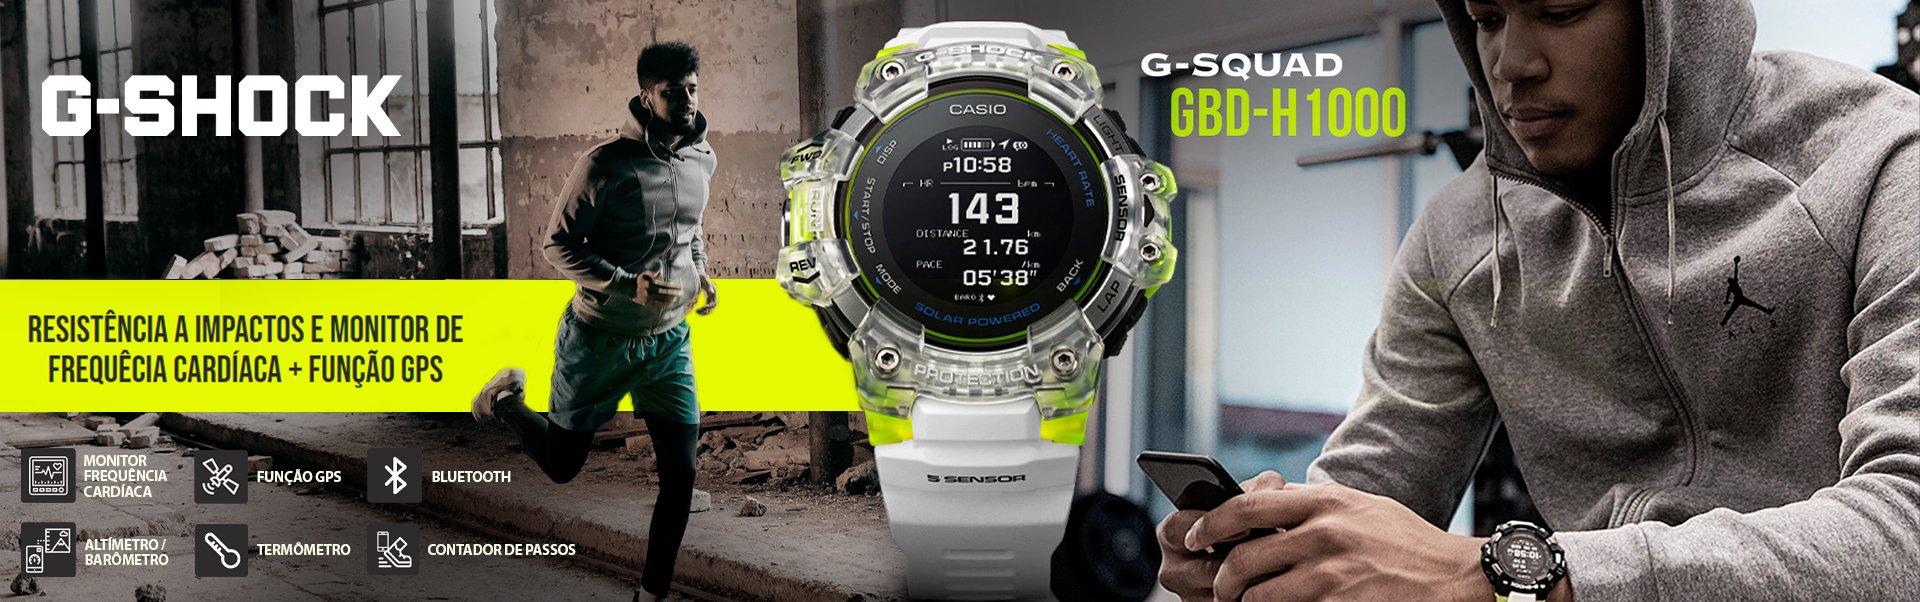 G-SHOCK Squad GBD-H1000